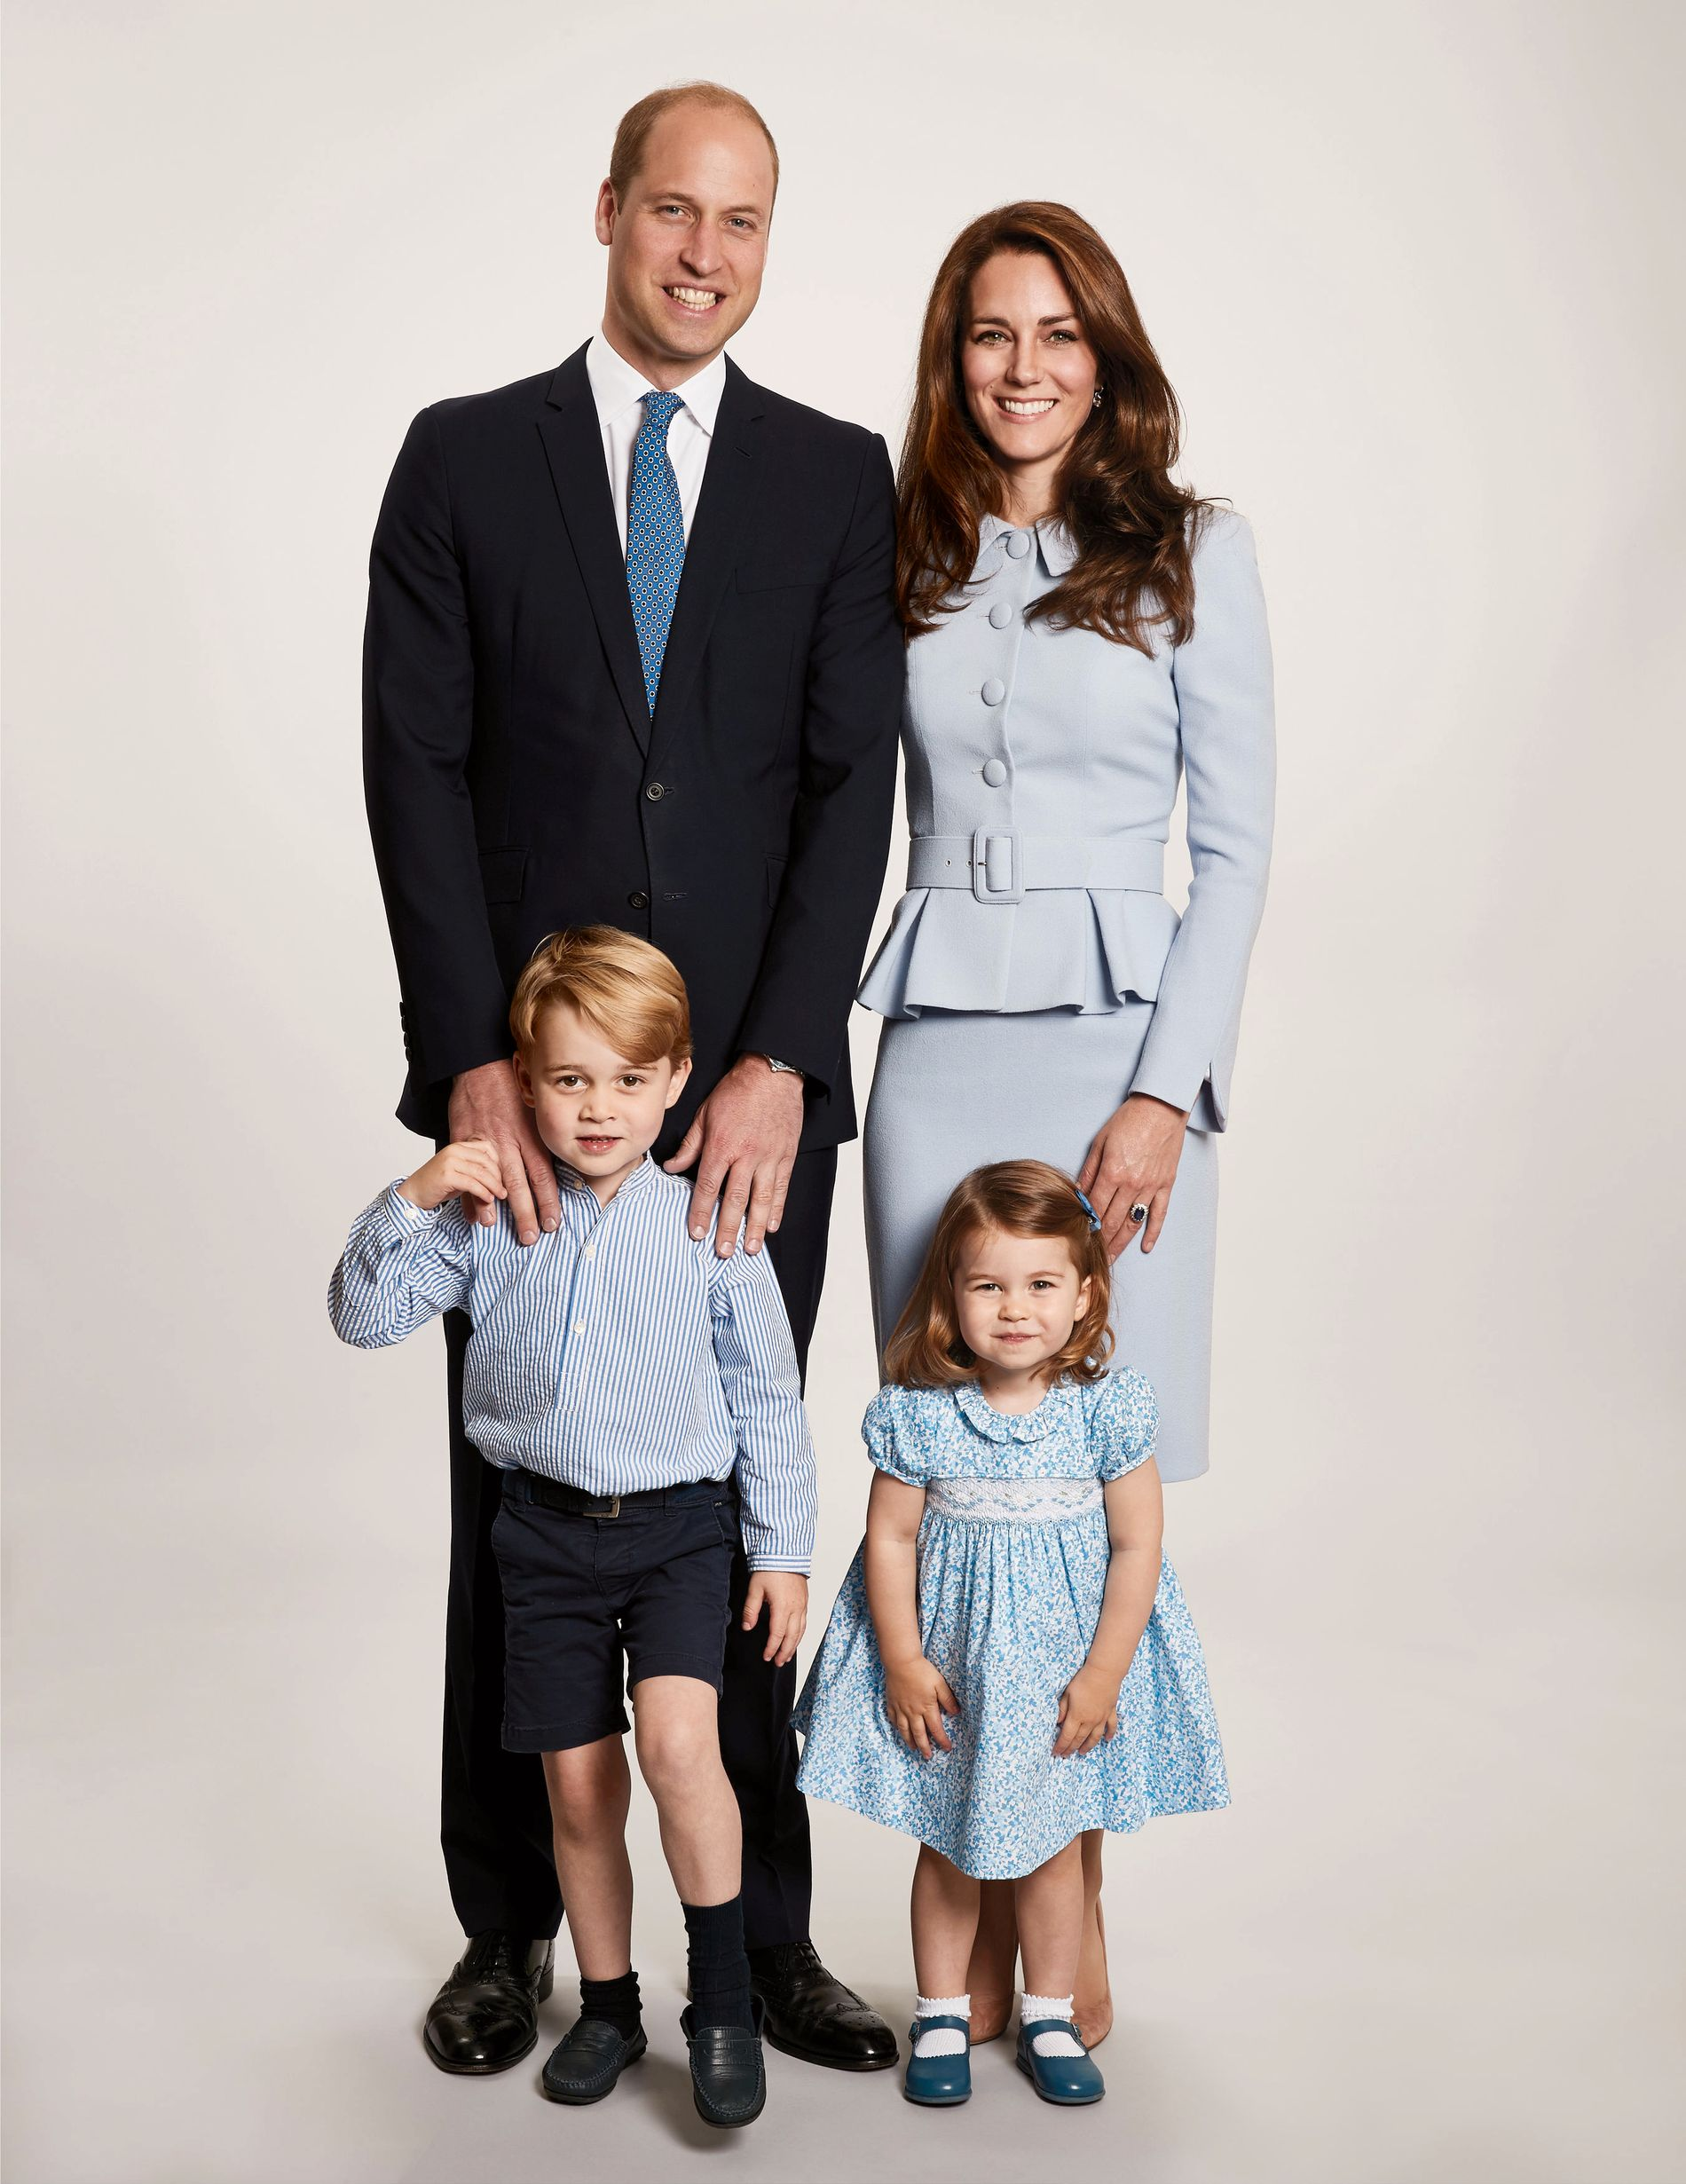 JULEKORT 2017: Hertugfamilien, prins William og hertuginne Catherine, samt barna prins George og prinsesse Charlotte.